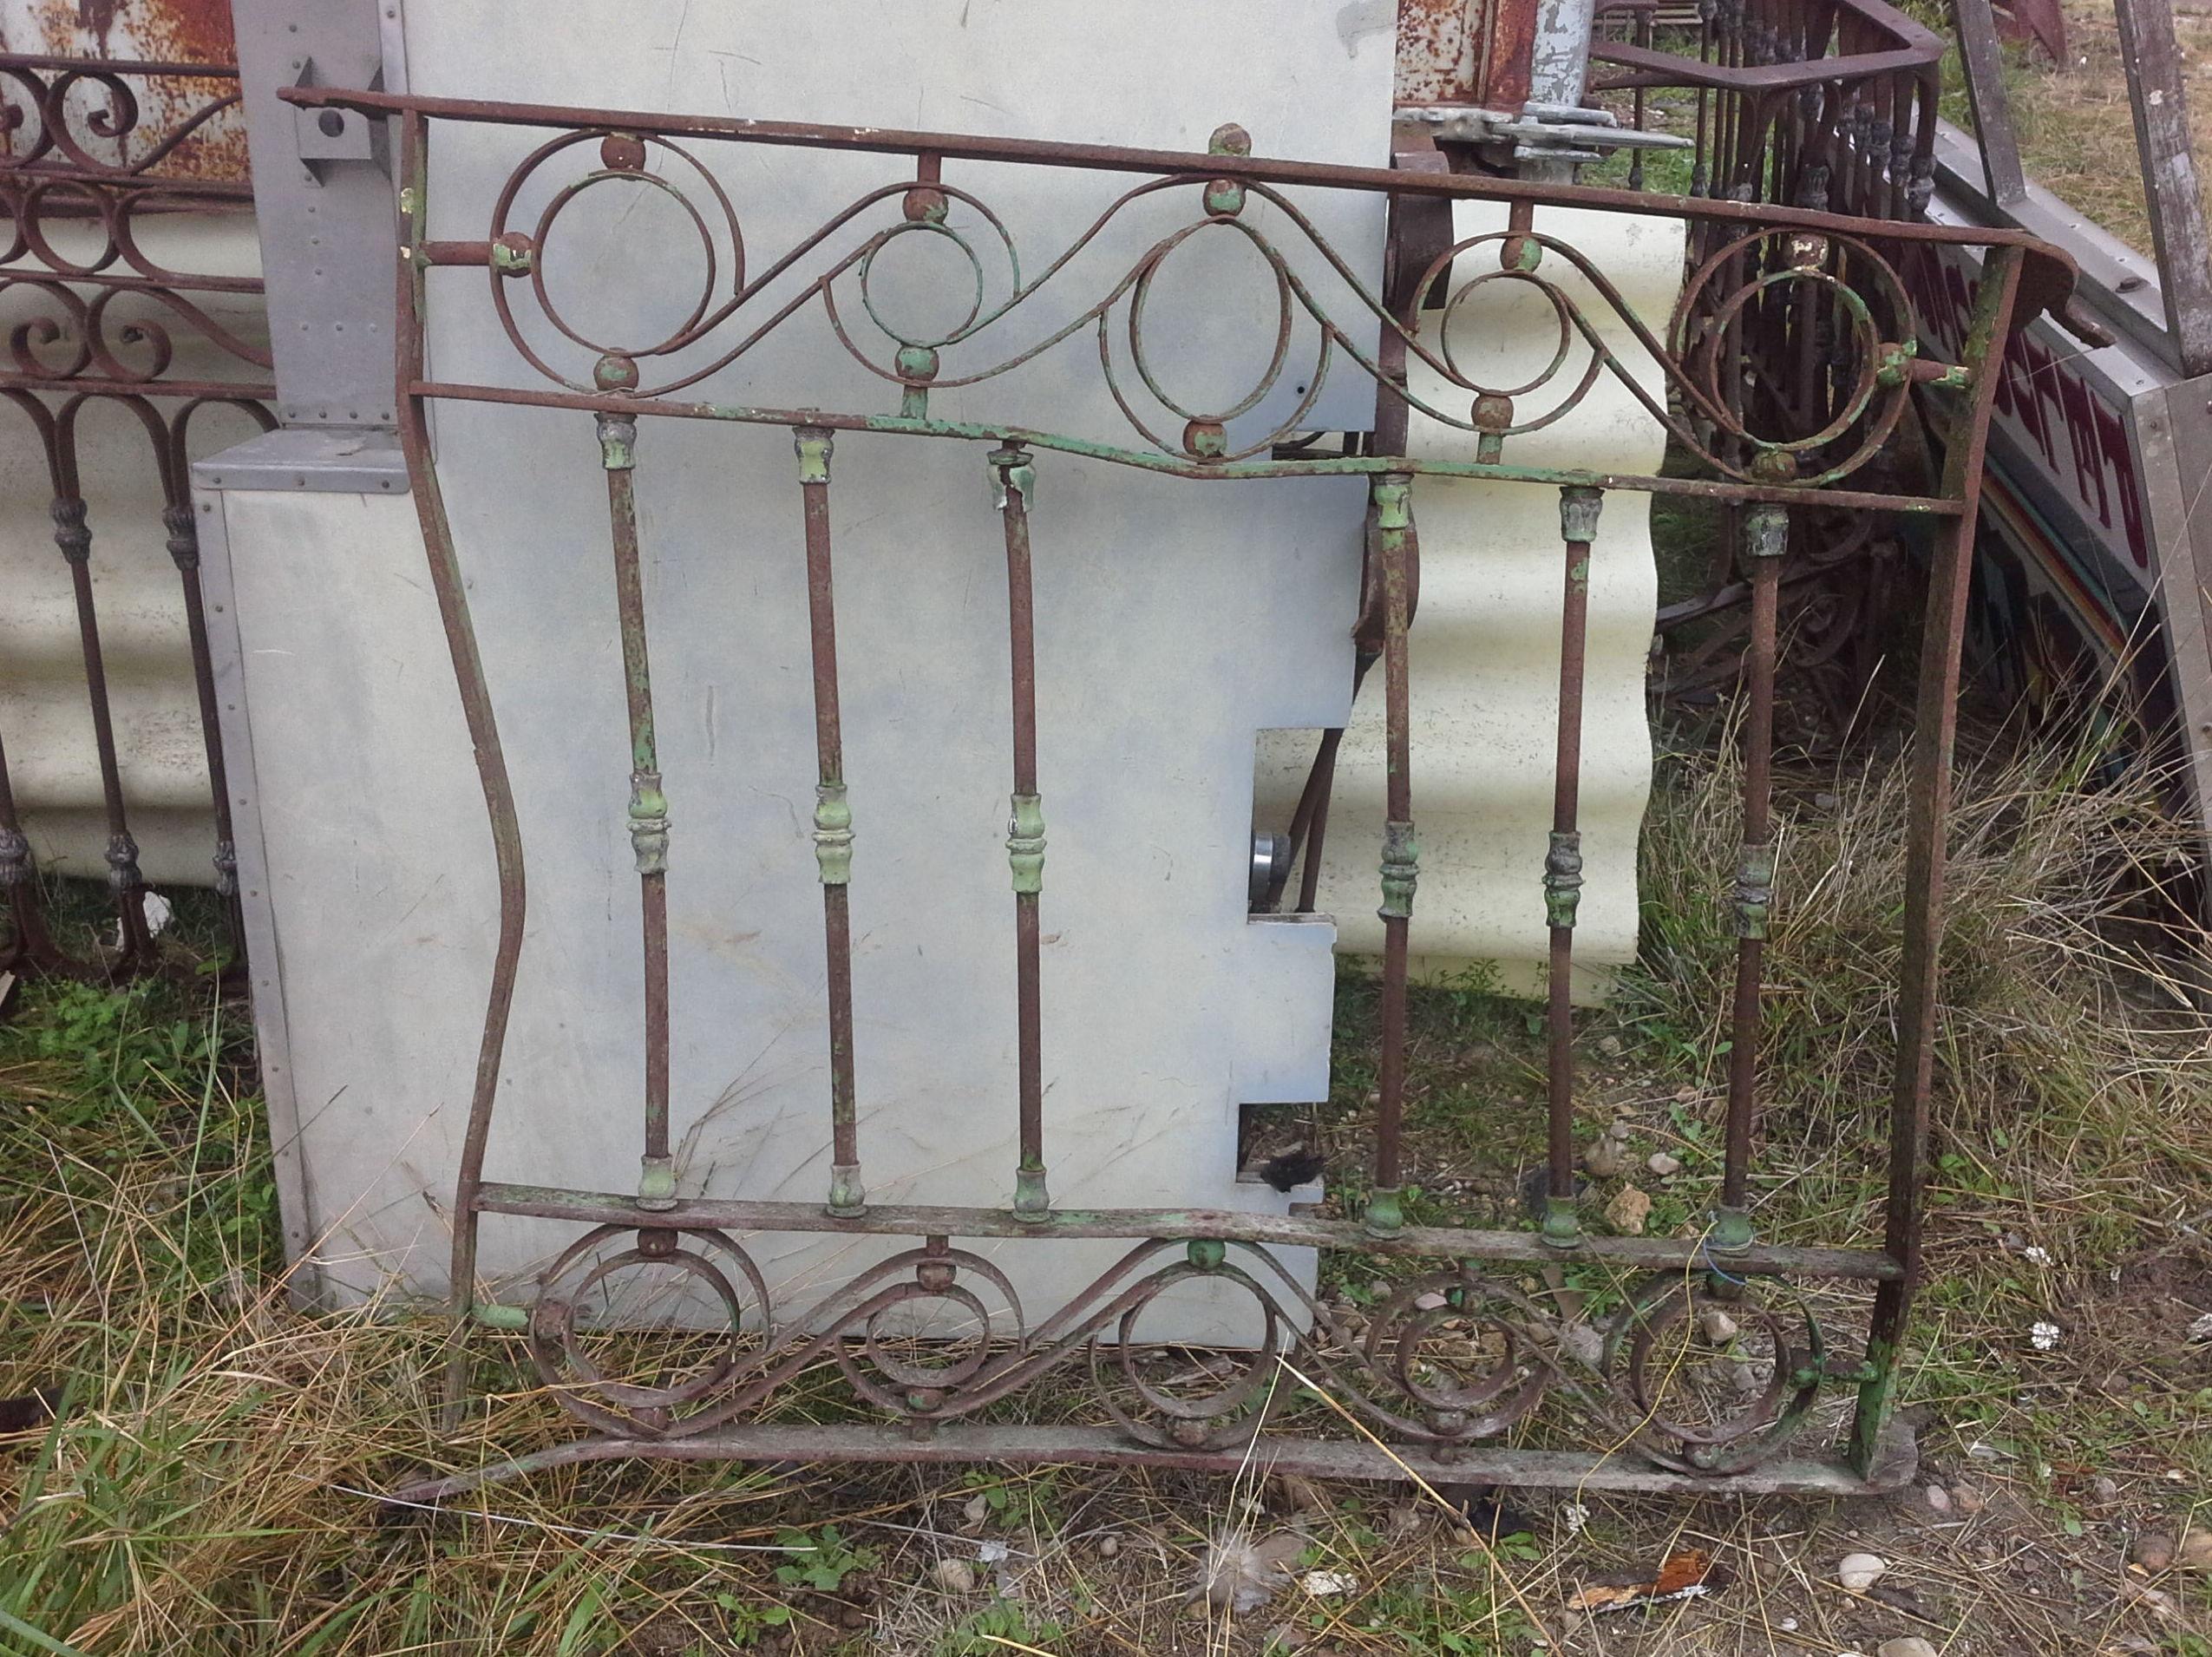 Balcon: Catálogo de Desguaces y Chatarras Clemente